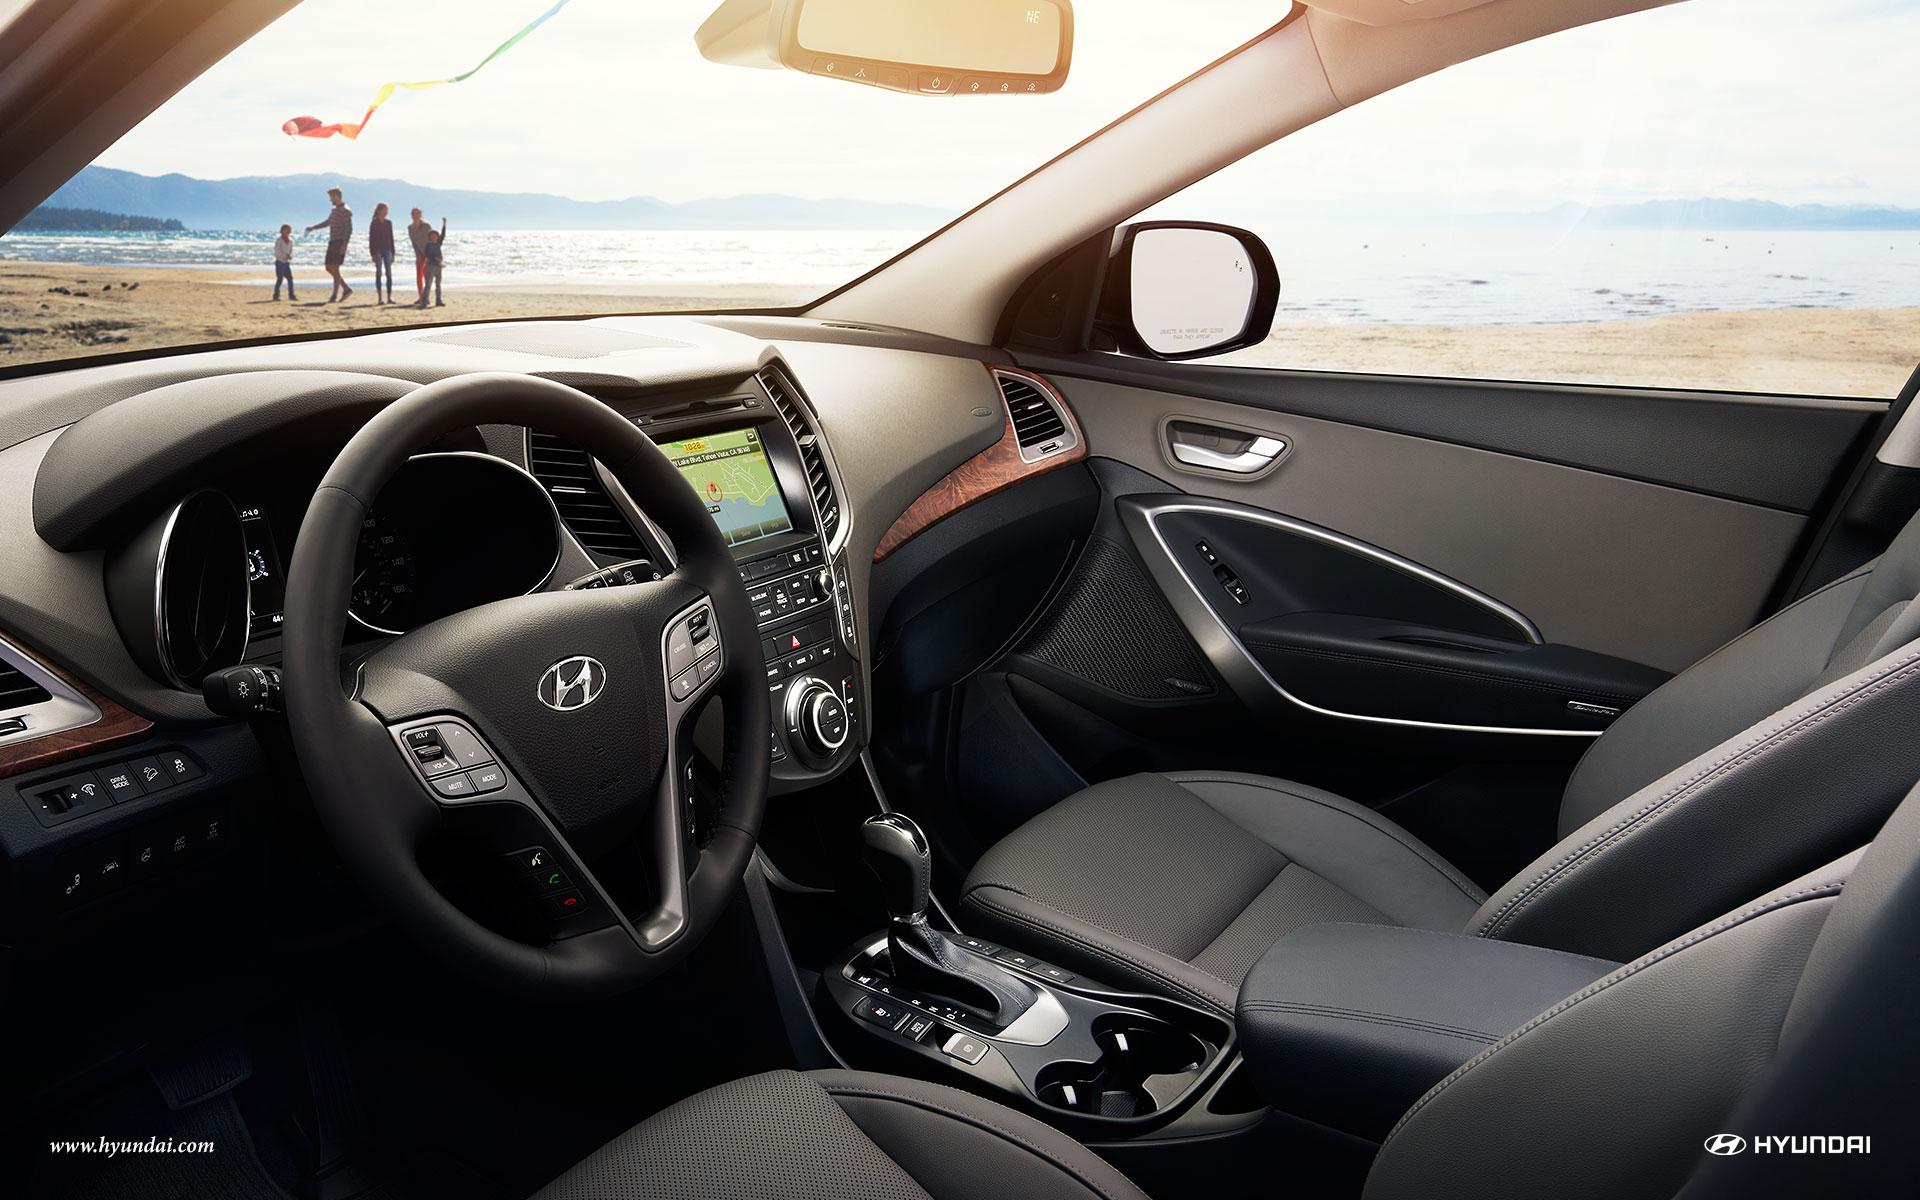 Used Hyundai Santa Fe for Sale in Southfield MI - 2018 Hyundai Santa Fe's Mechanical